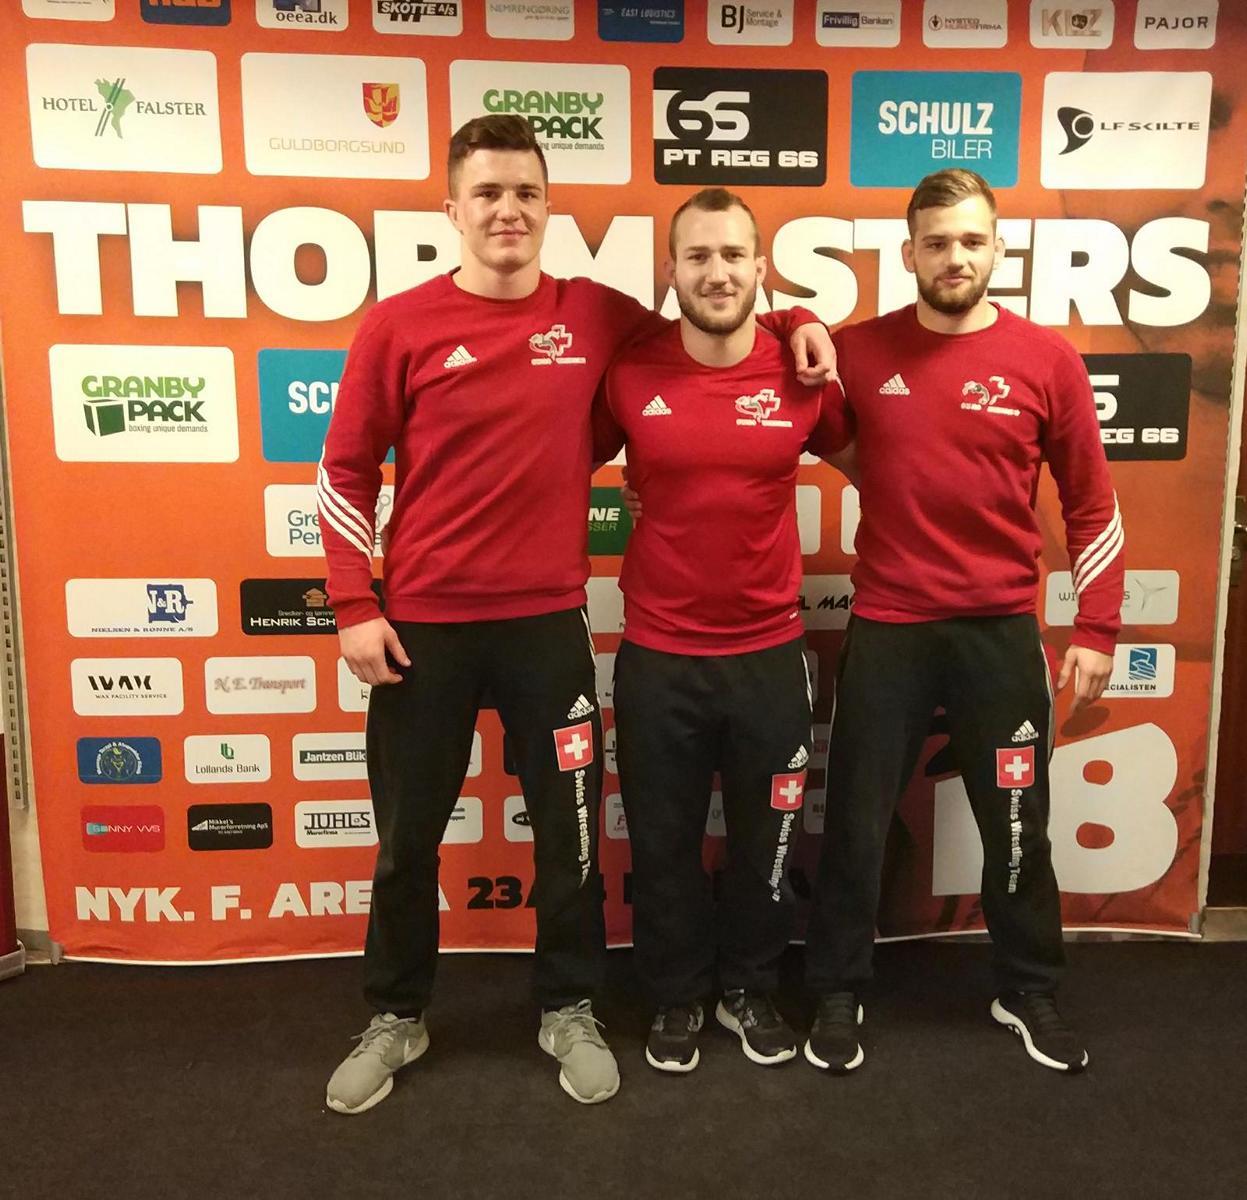 Thor Masters 2018 Dänemark